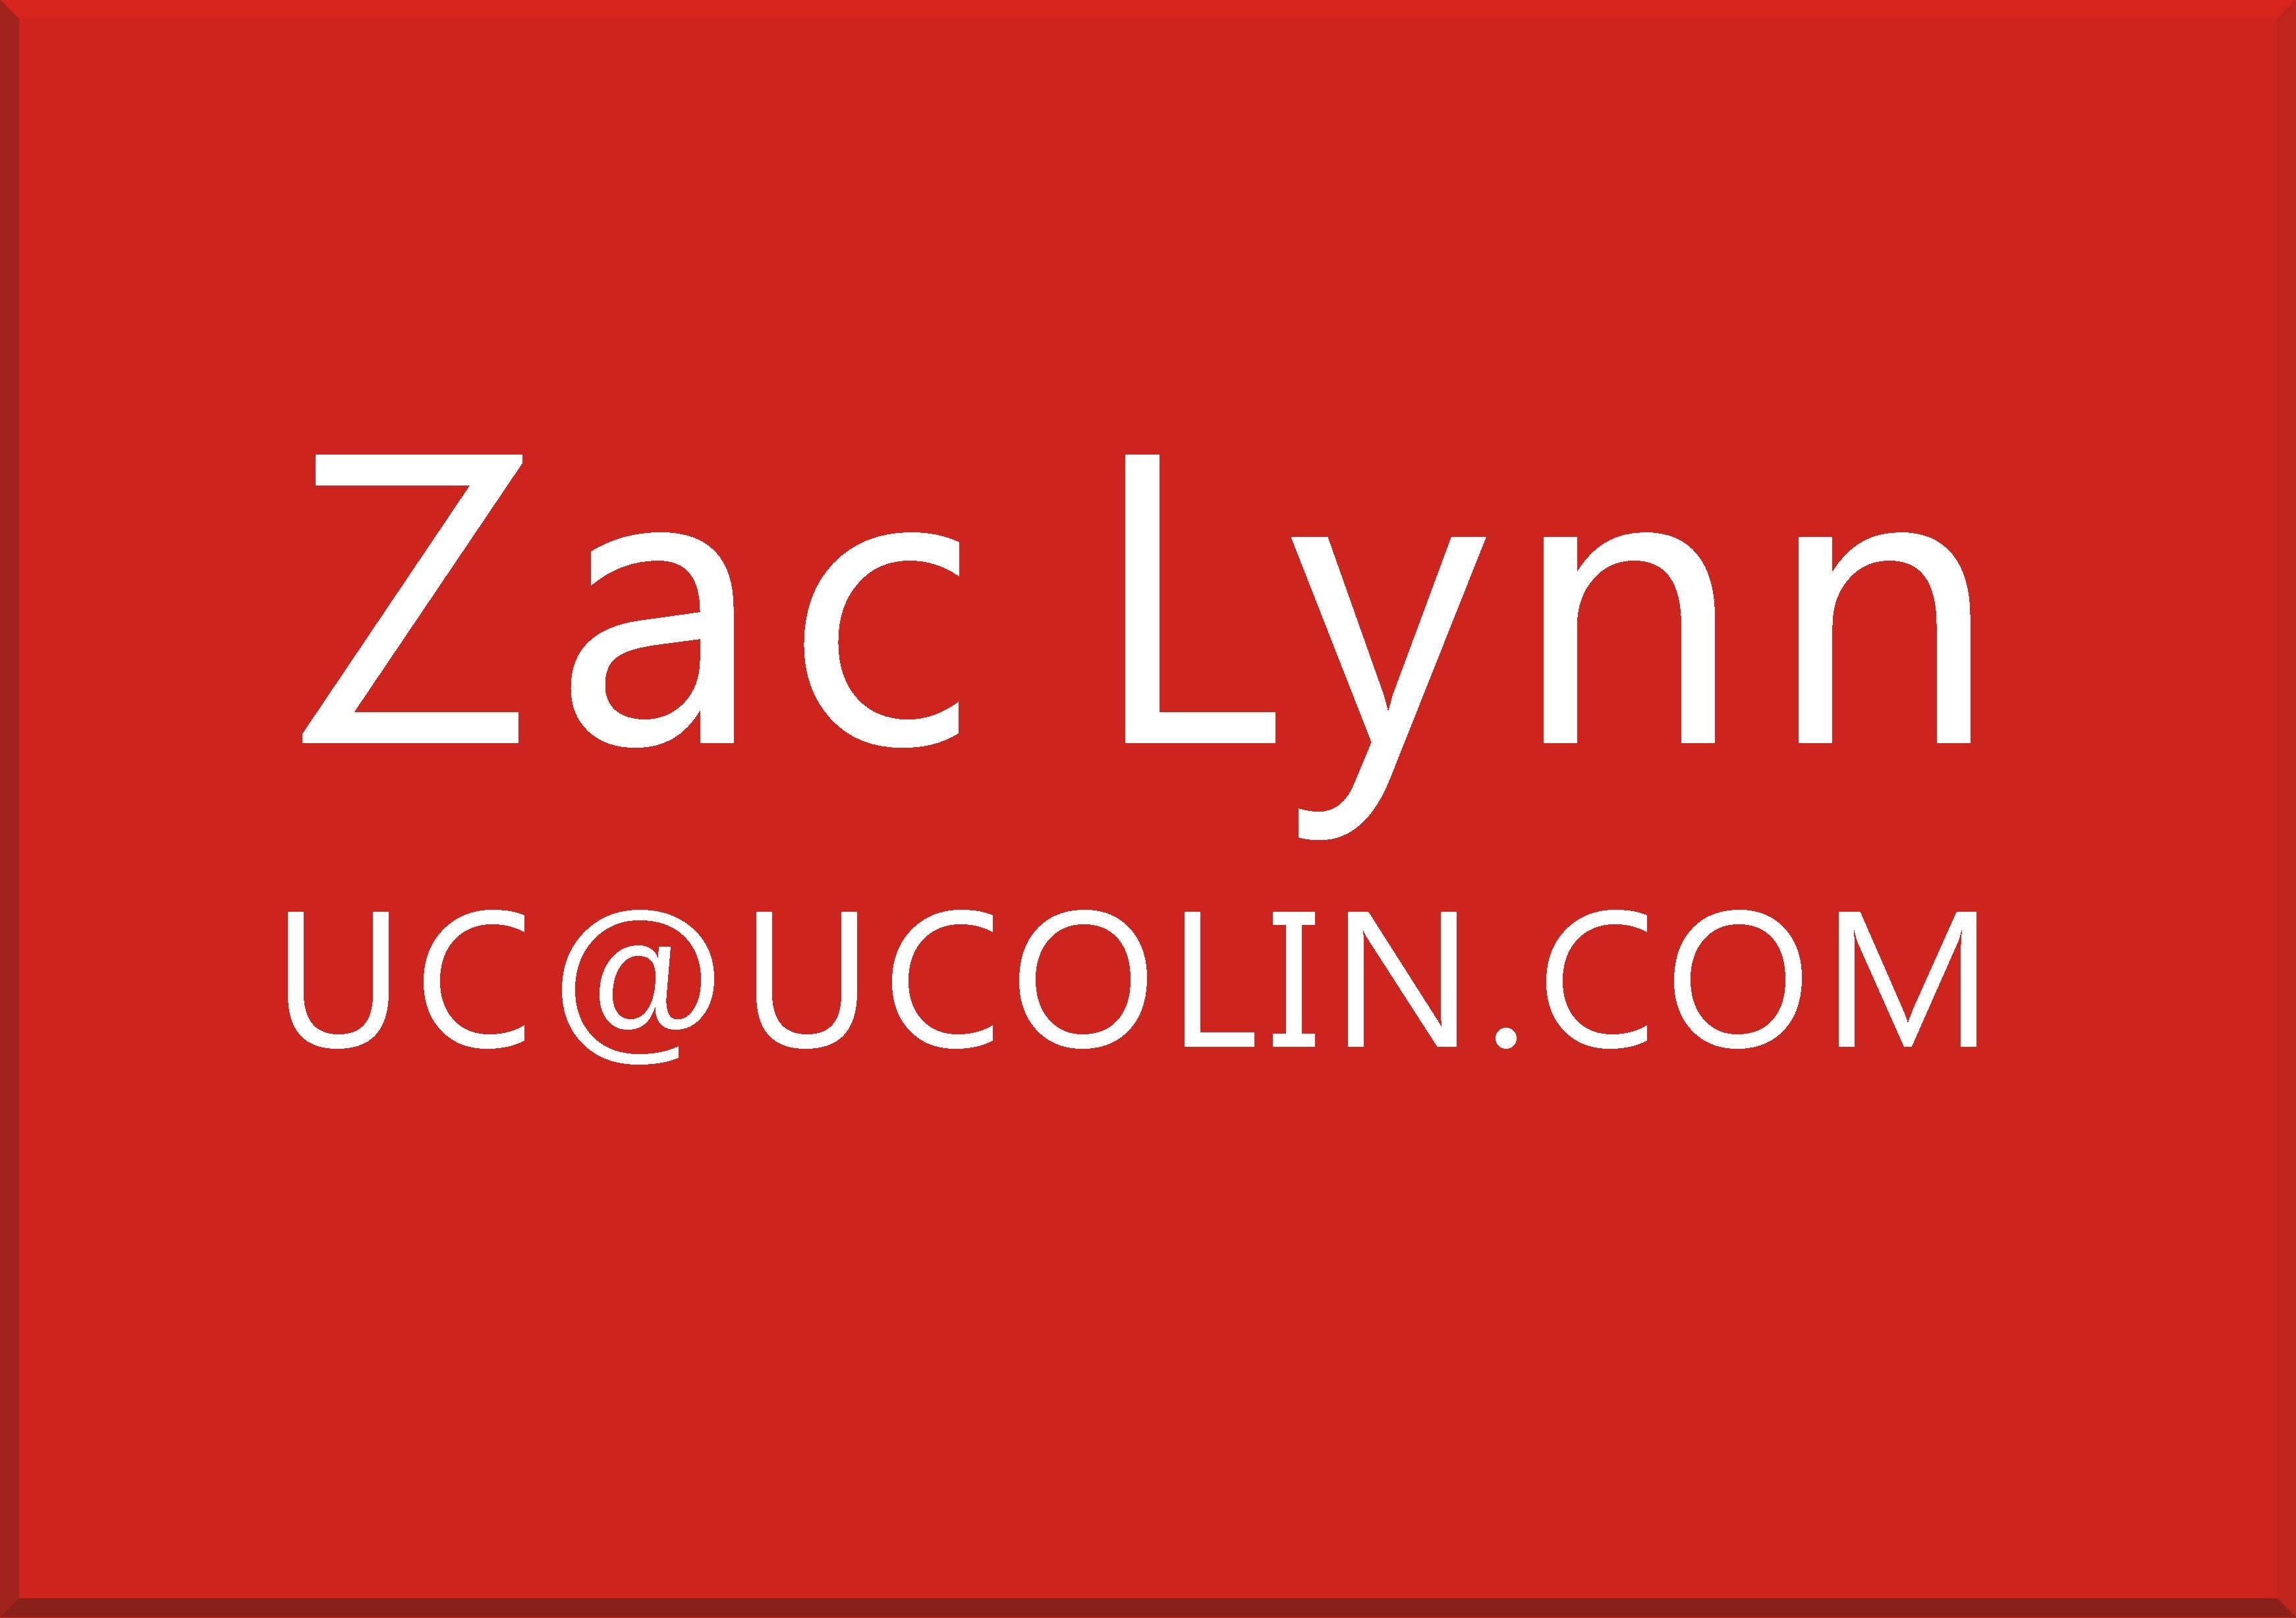 ZAC LYNN  UC@UCOLIN.COM